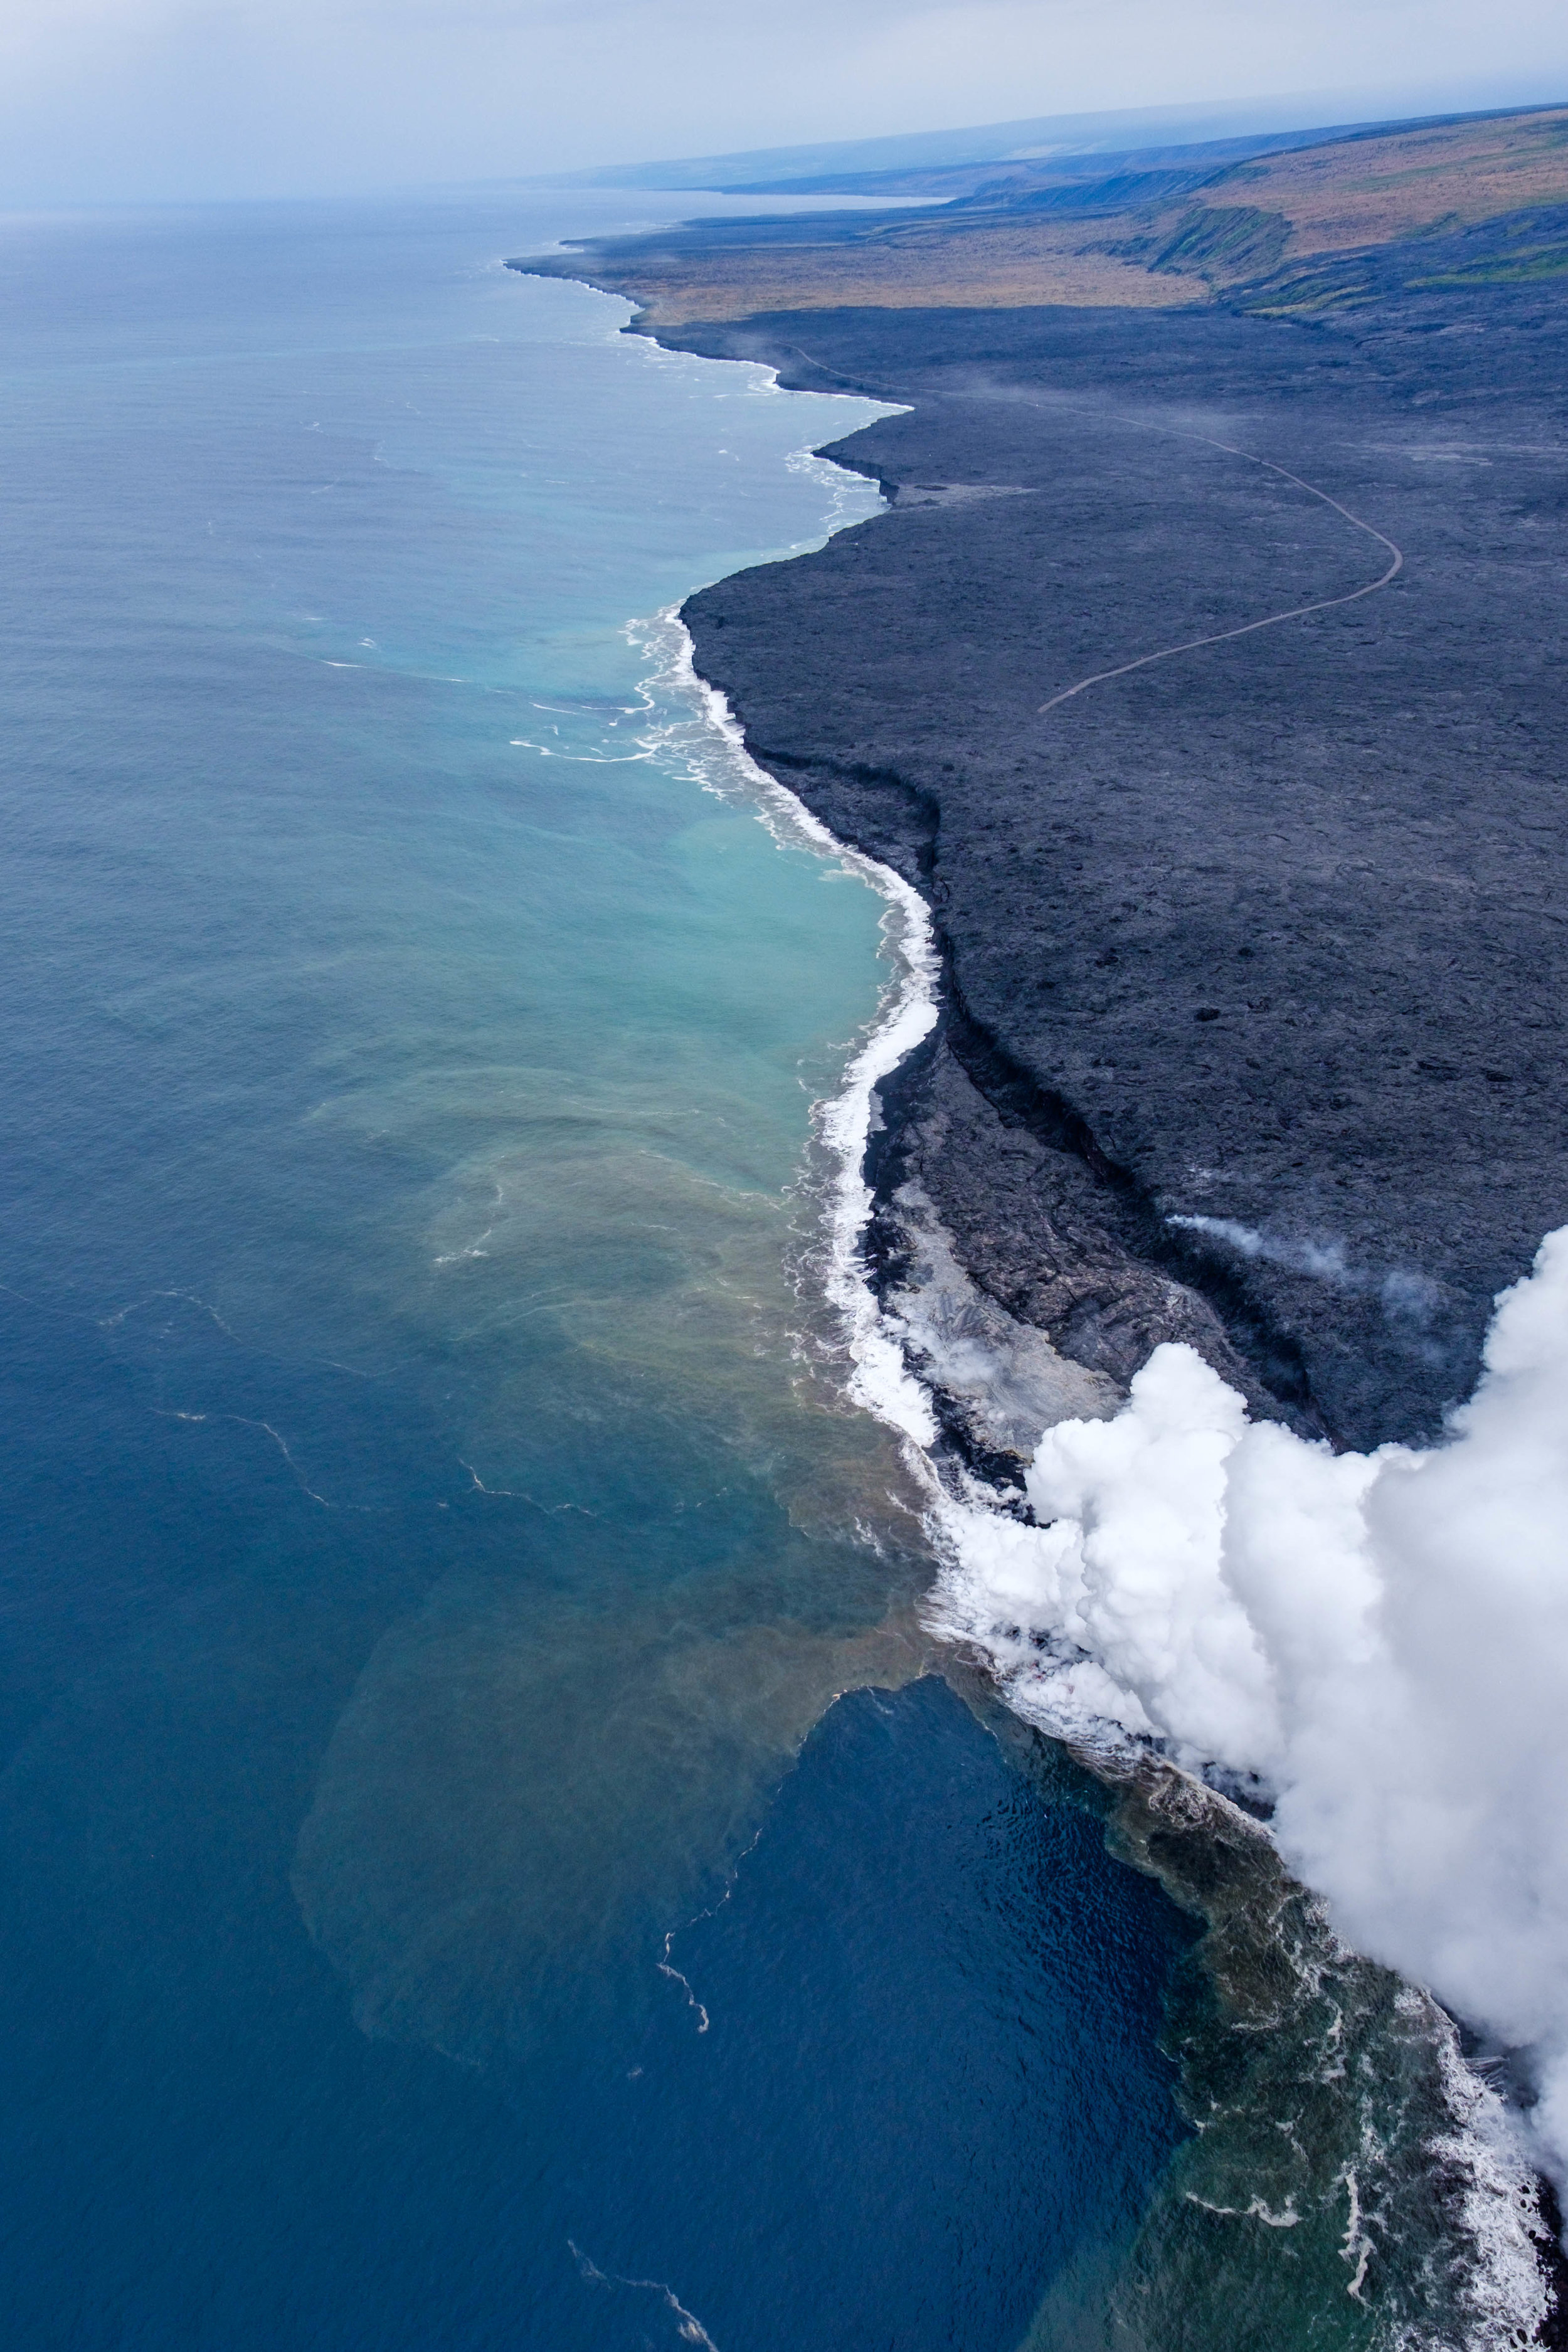 We do a few circles around the lava.